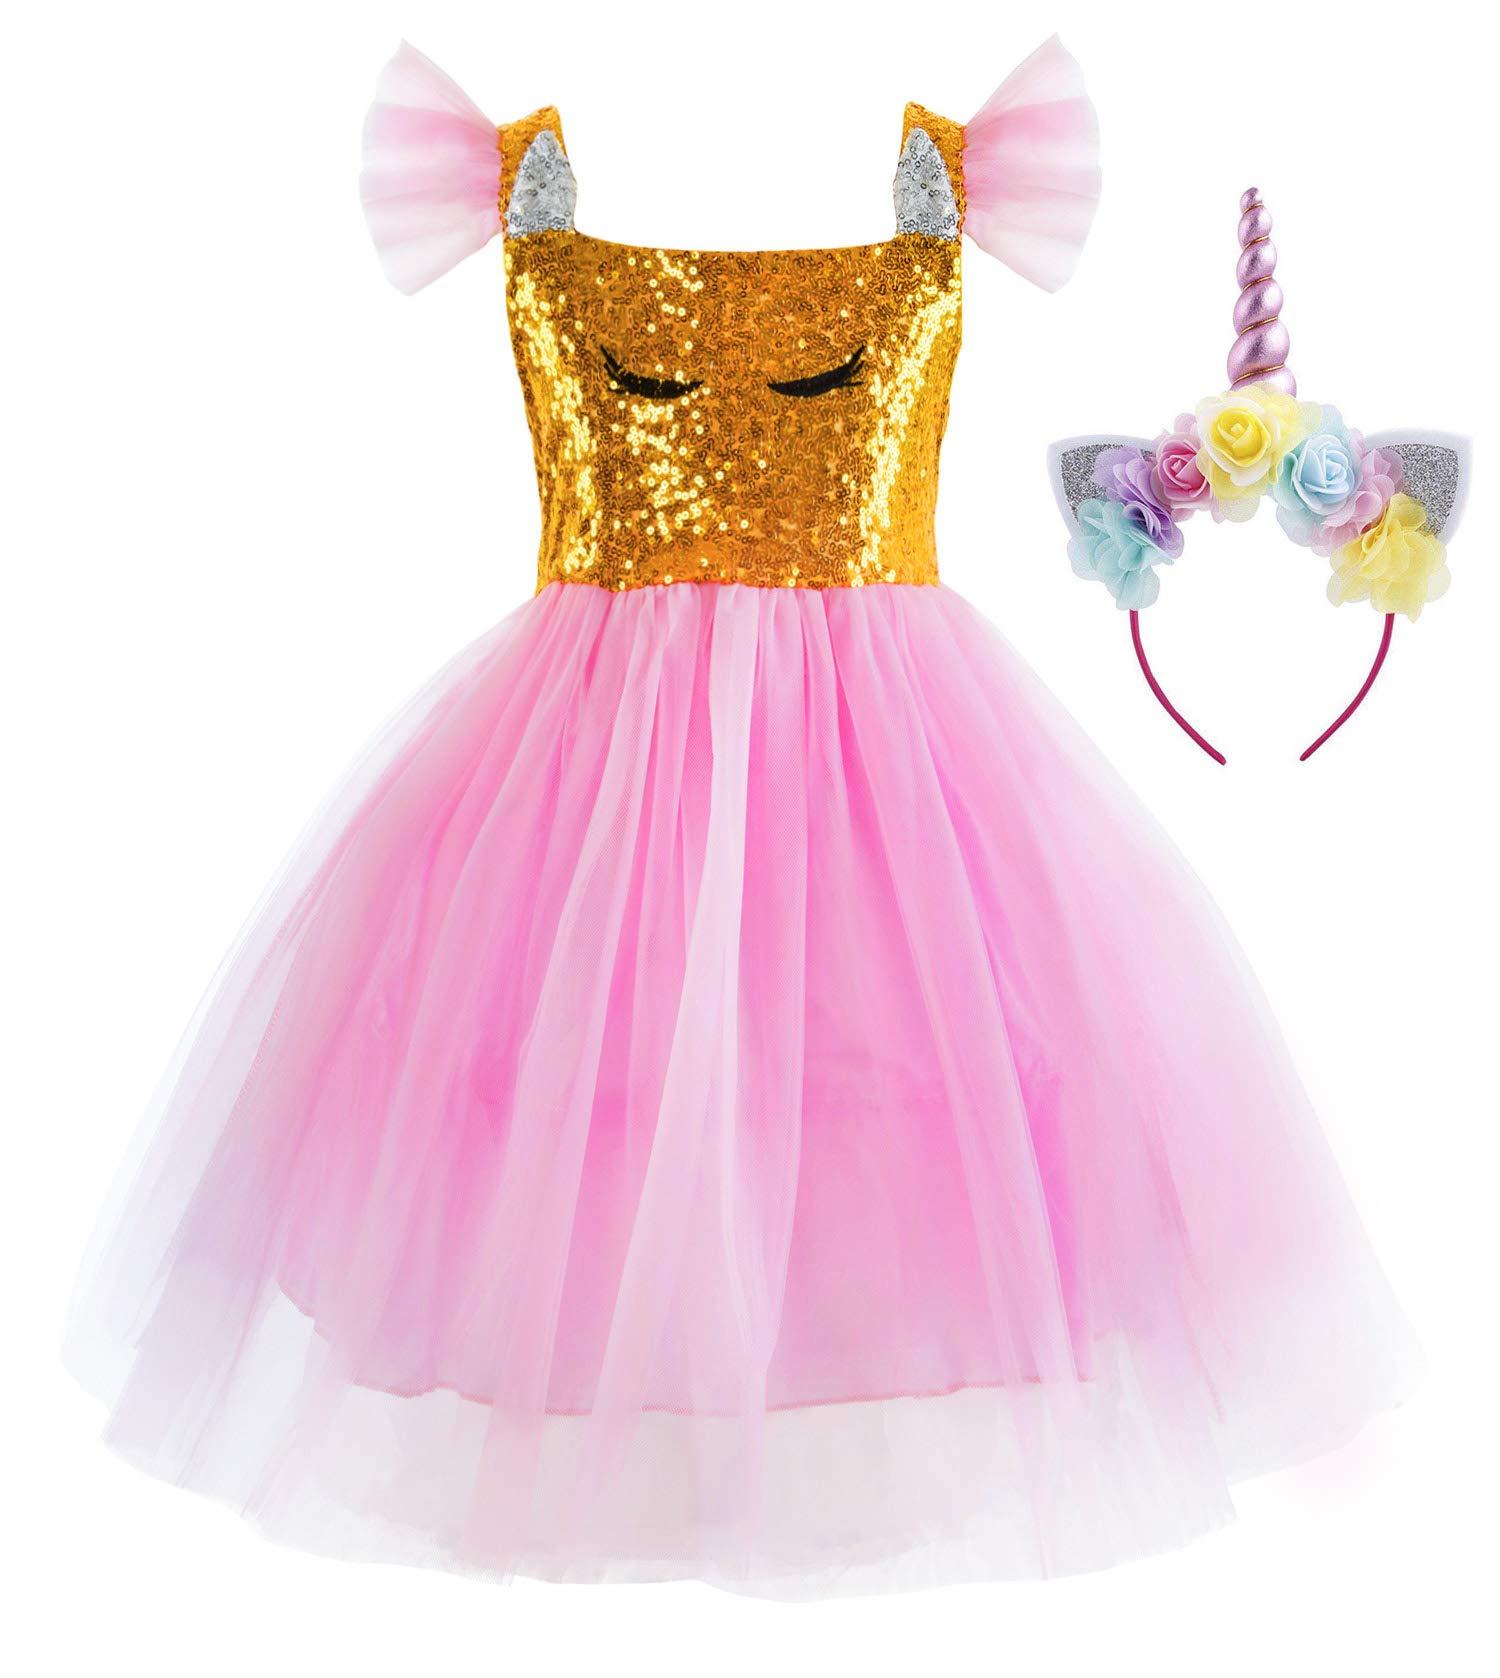 Princess Cinderella Rapunzel Little Mermaid Dress